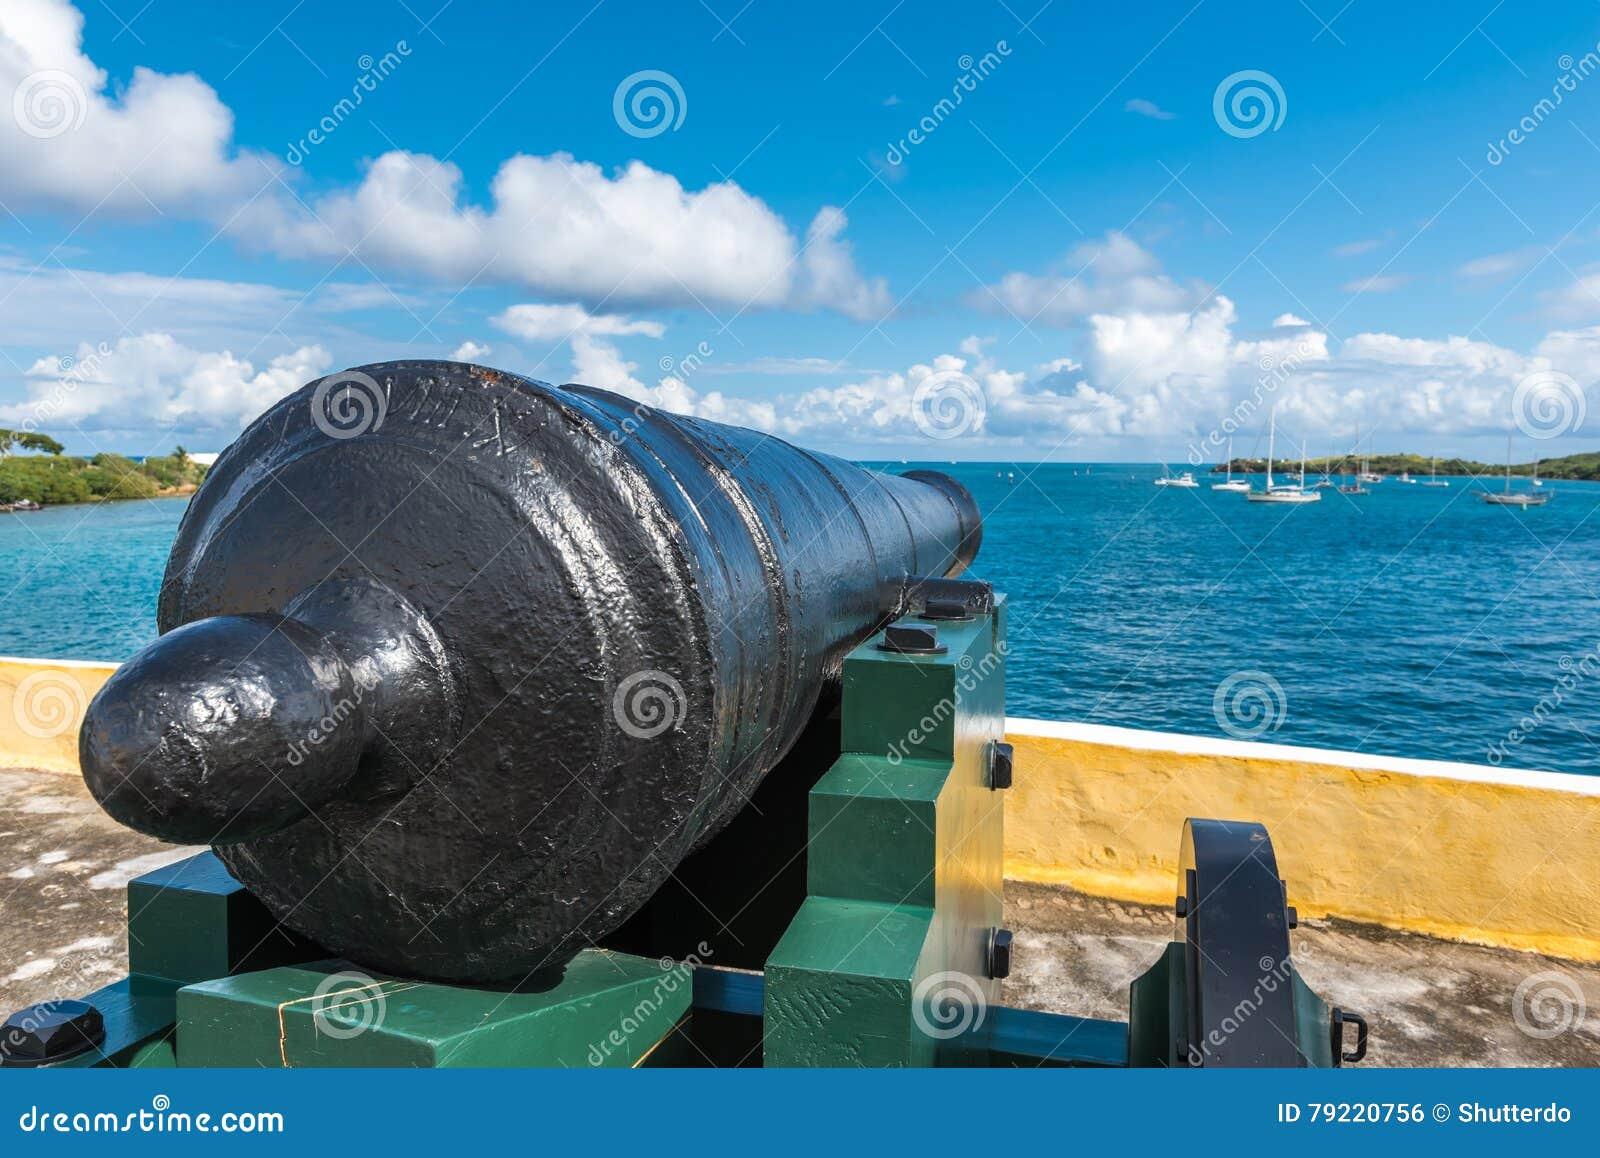 Vintage cannon facing the Caribbean ocean defending the bay. Vi